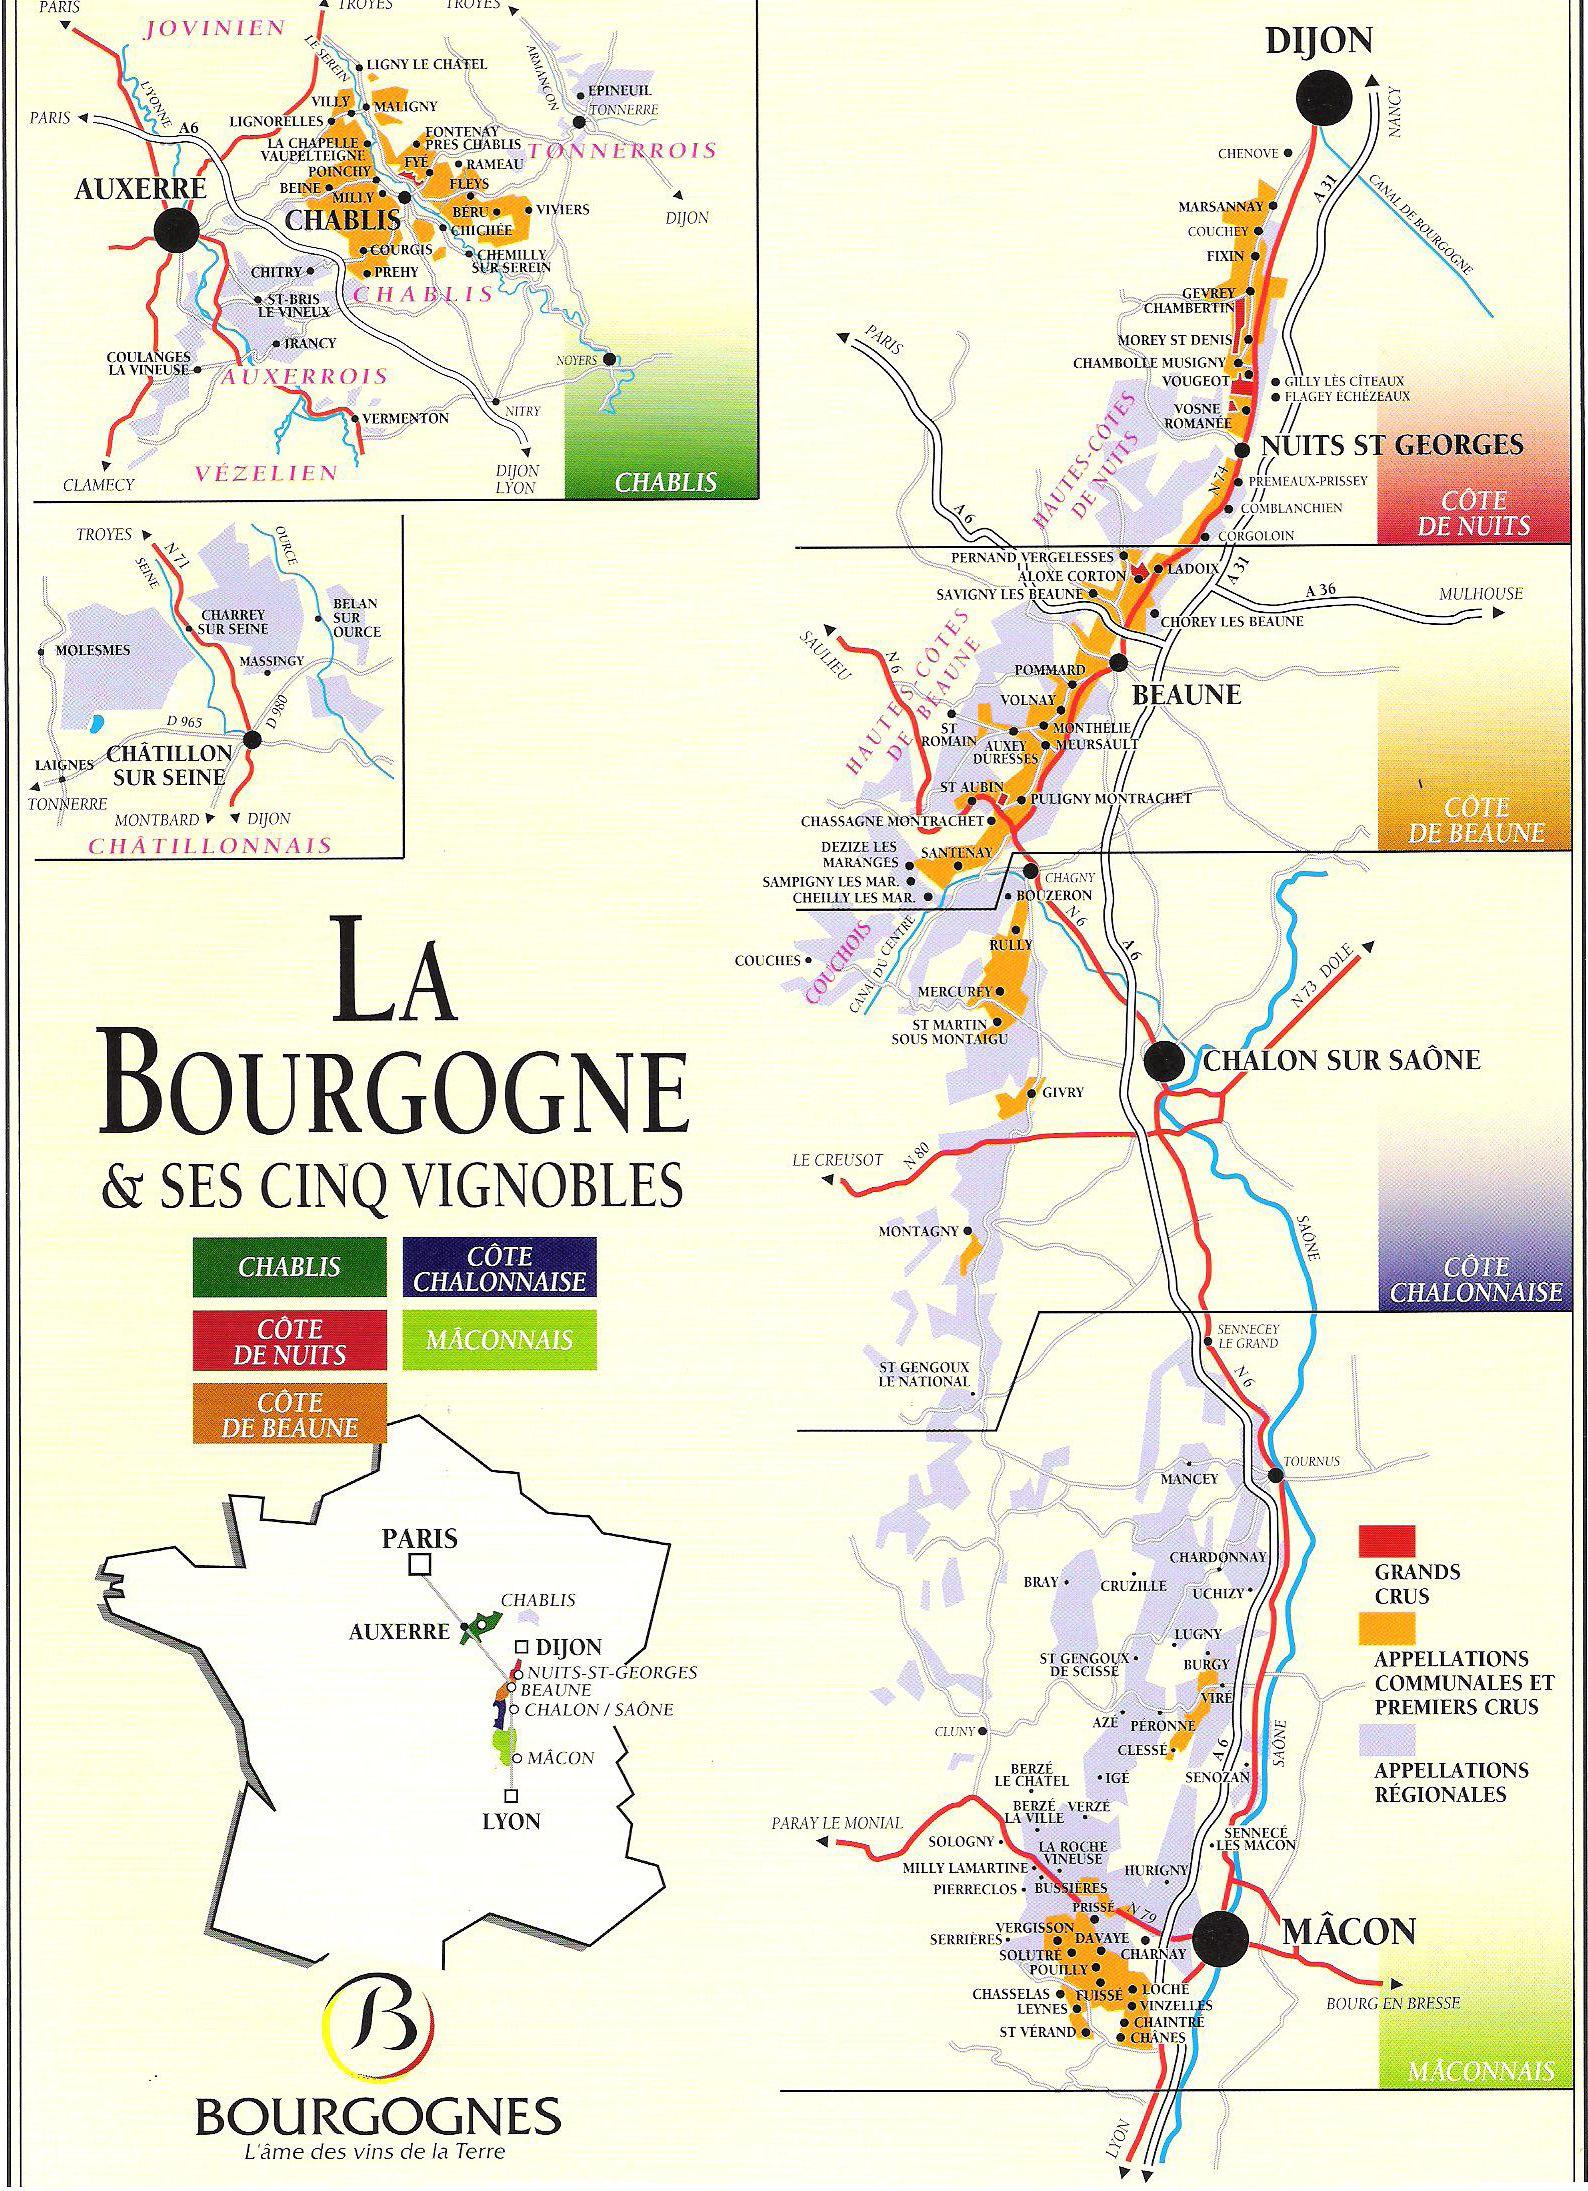 Bourgogne Or Burgundy Wine Region Of France Go To Www Likegossip